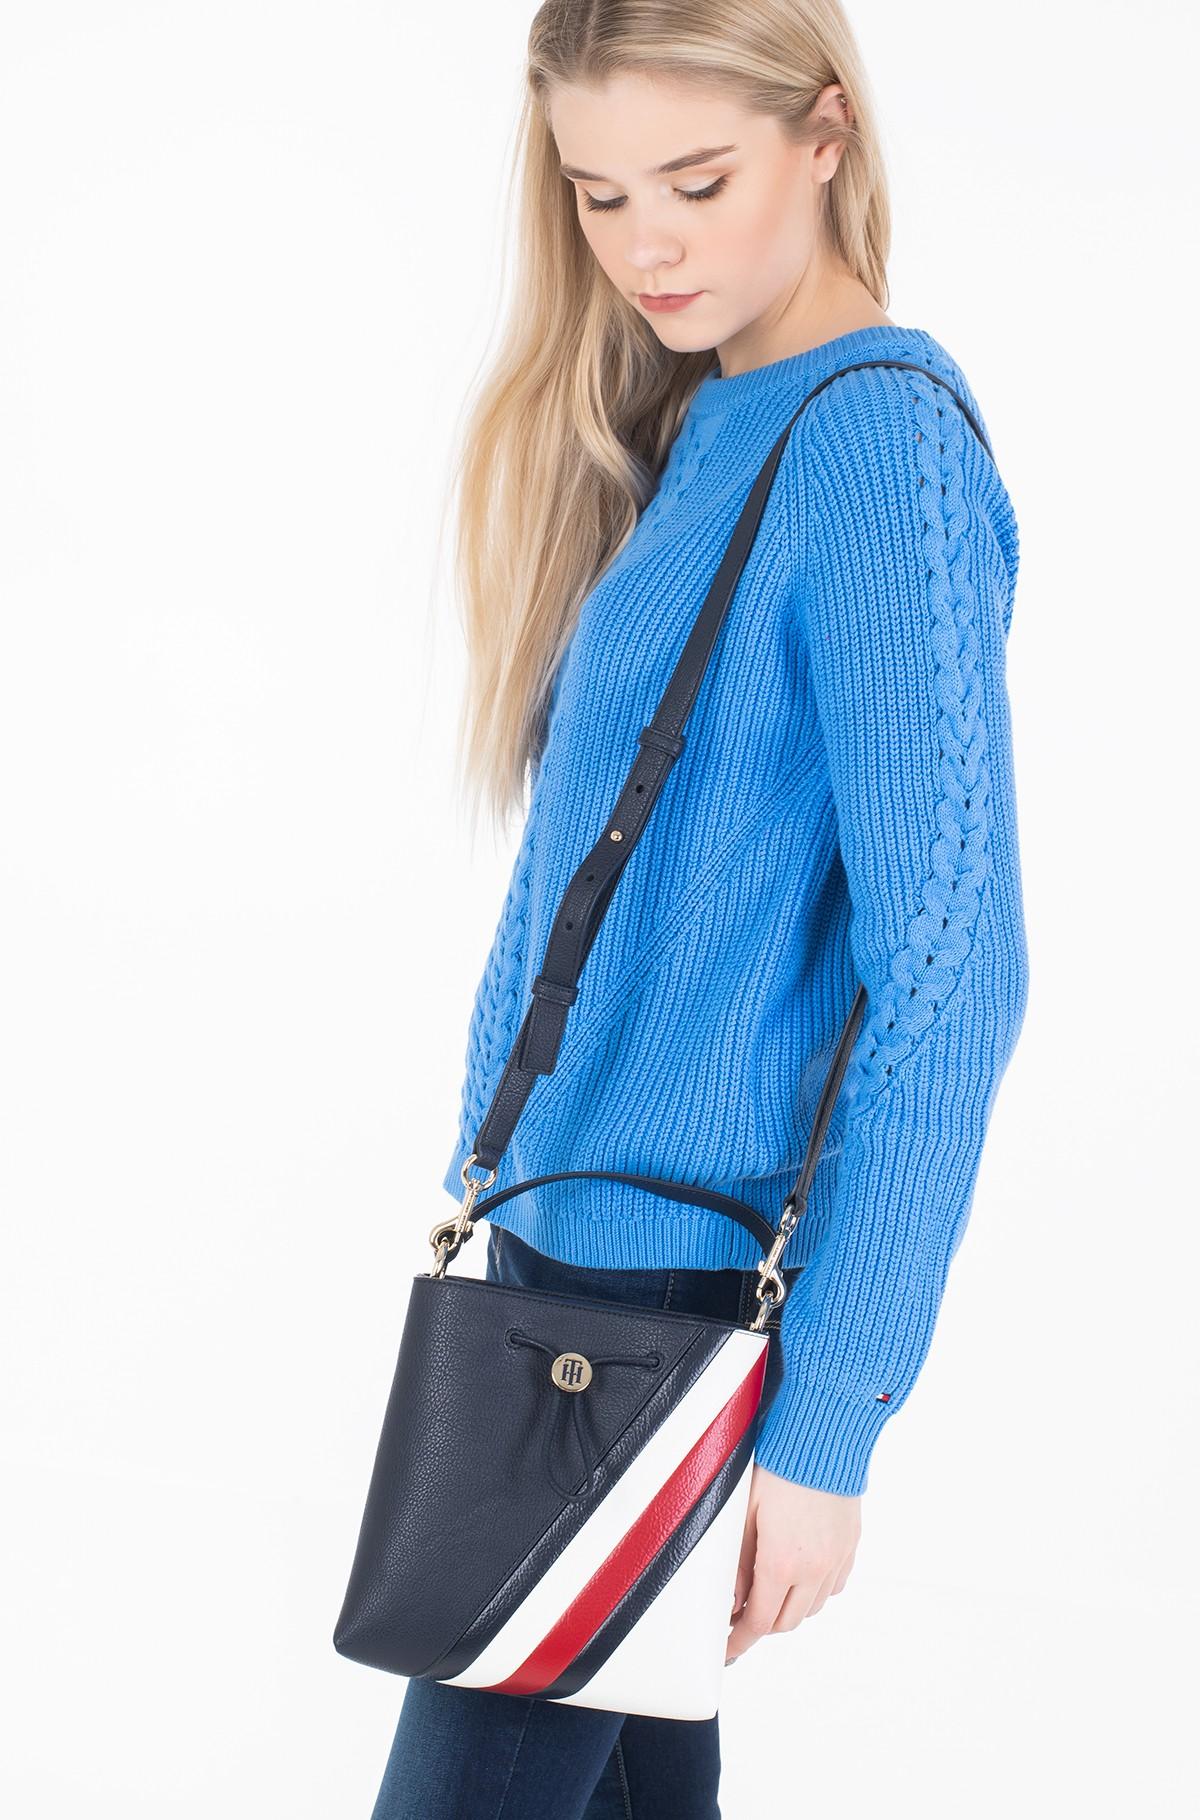 Handbag TH CORE MINI BUCKET-full-1